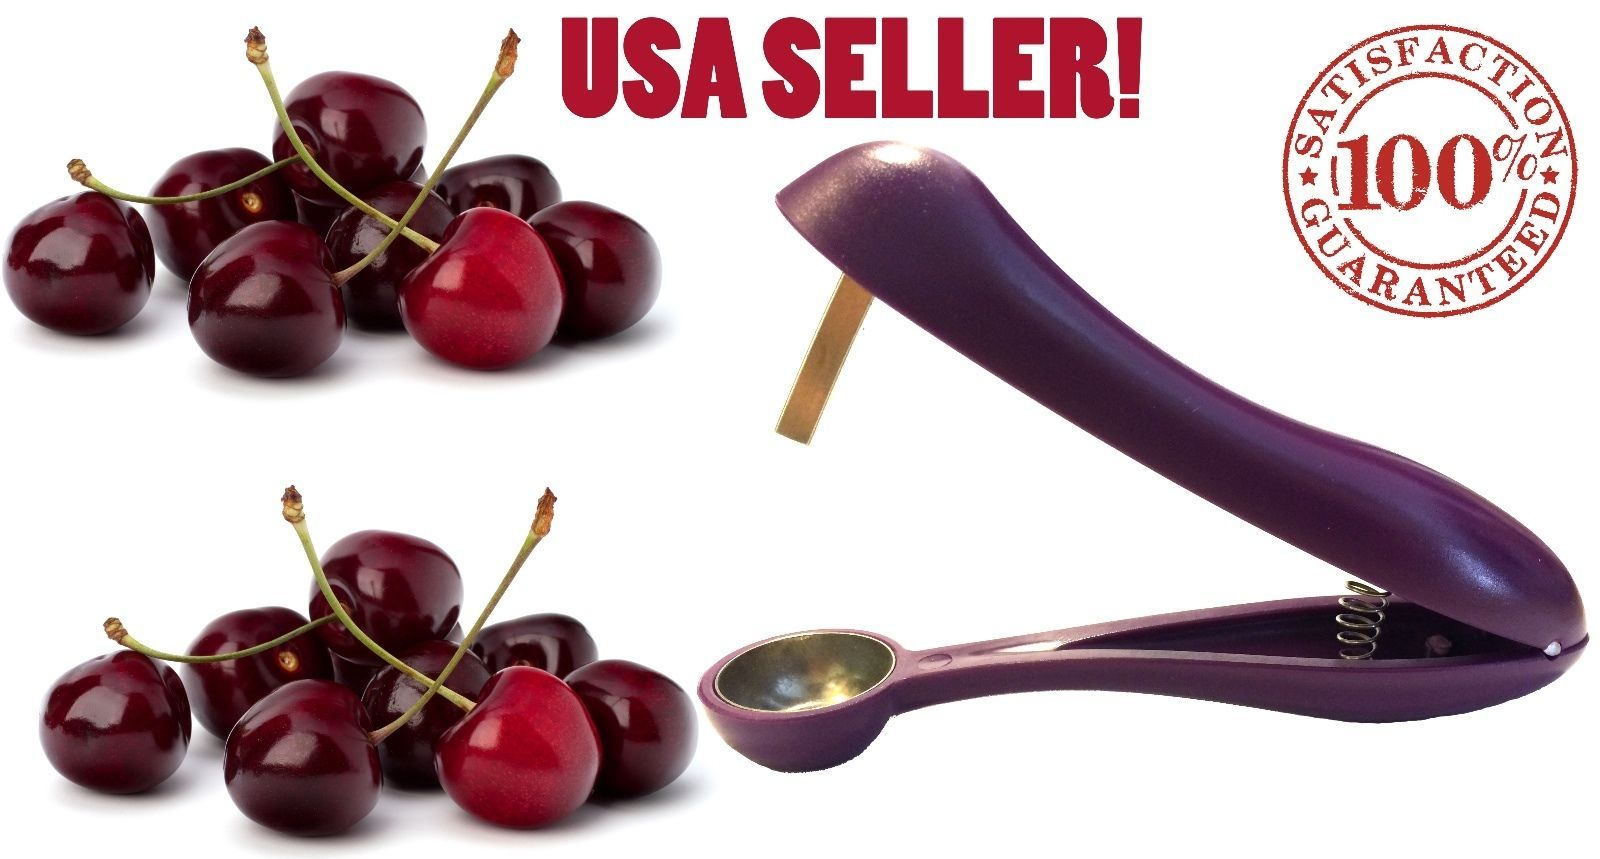 USA Seller Cherry Pitter Olive Stoner Corer Hand Held Seed Remover Cherries Tool